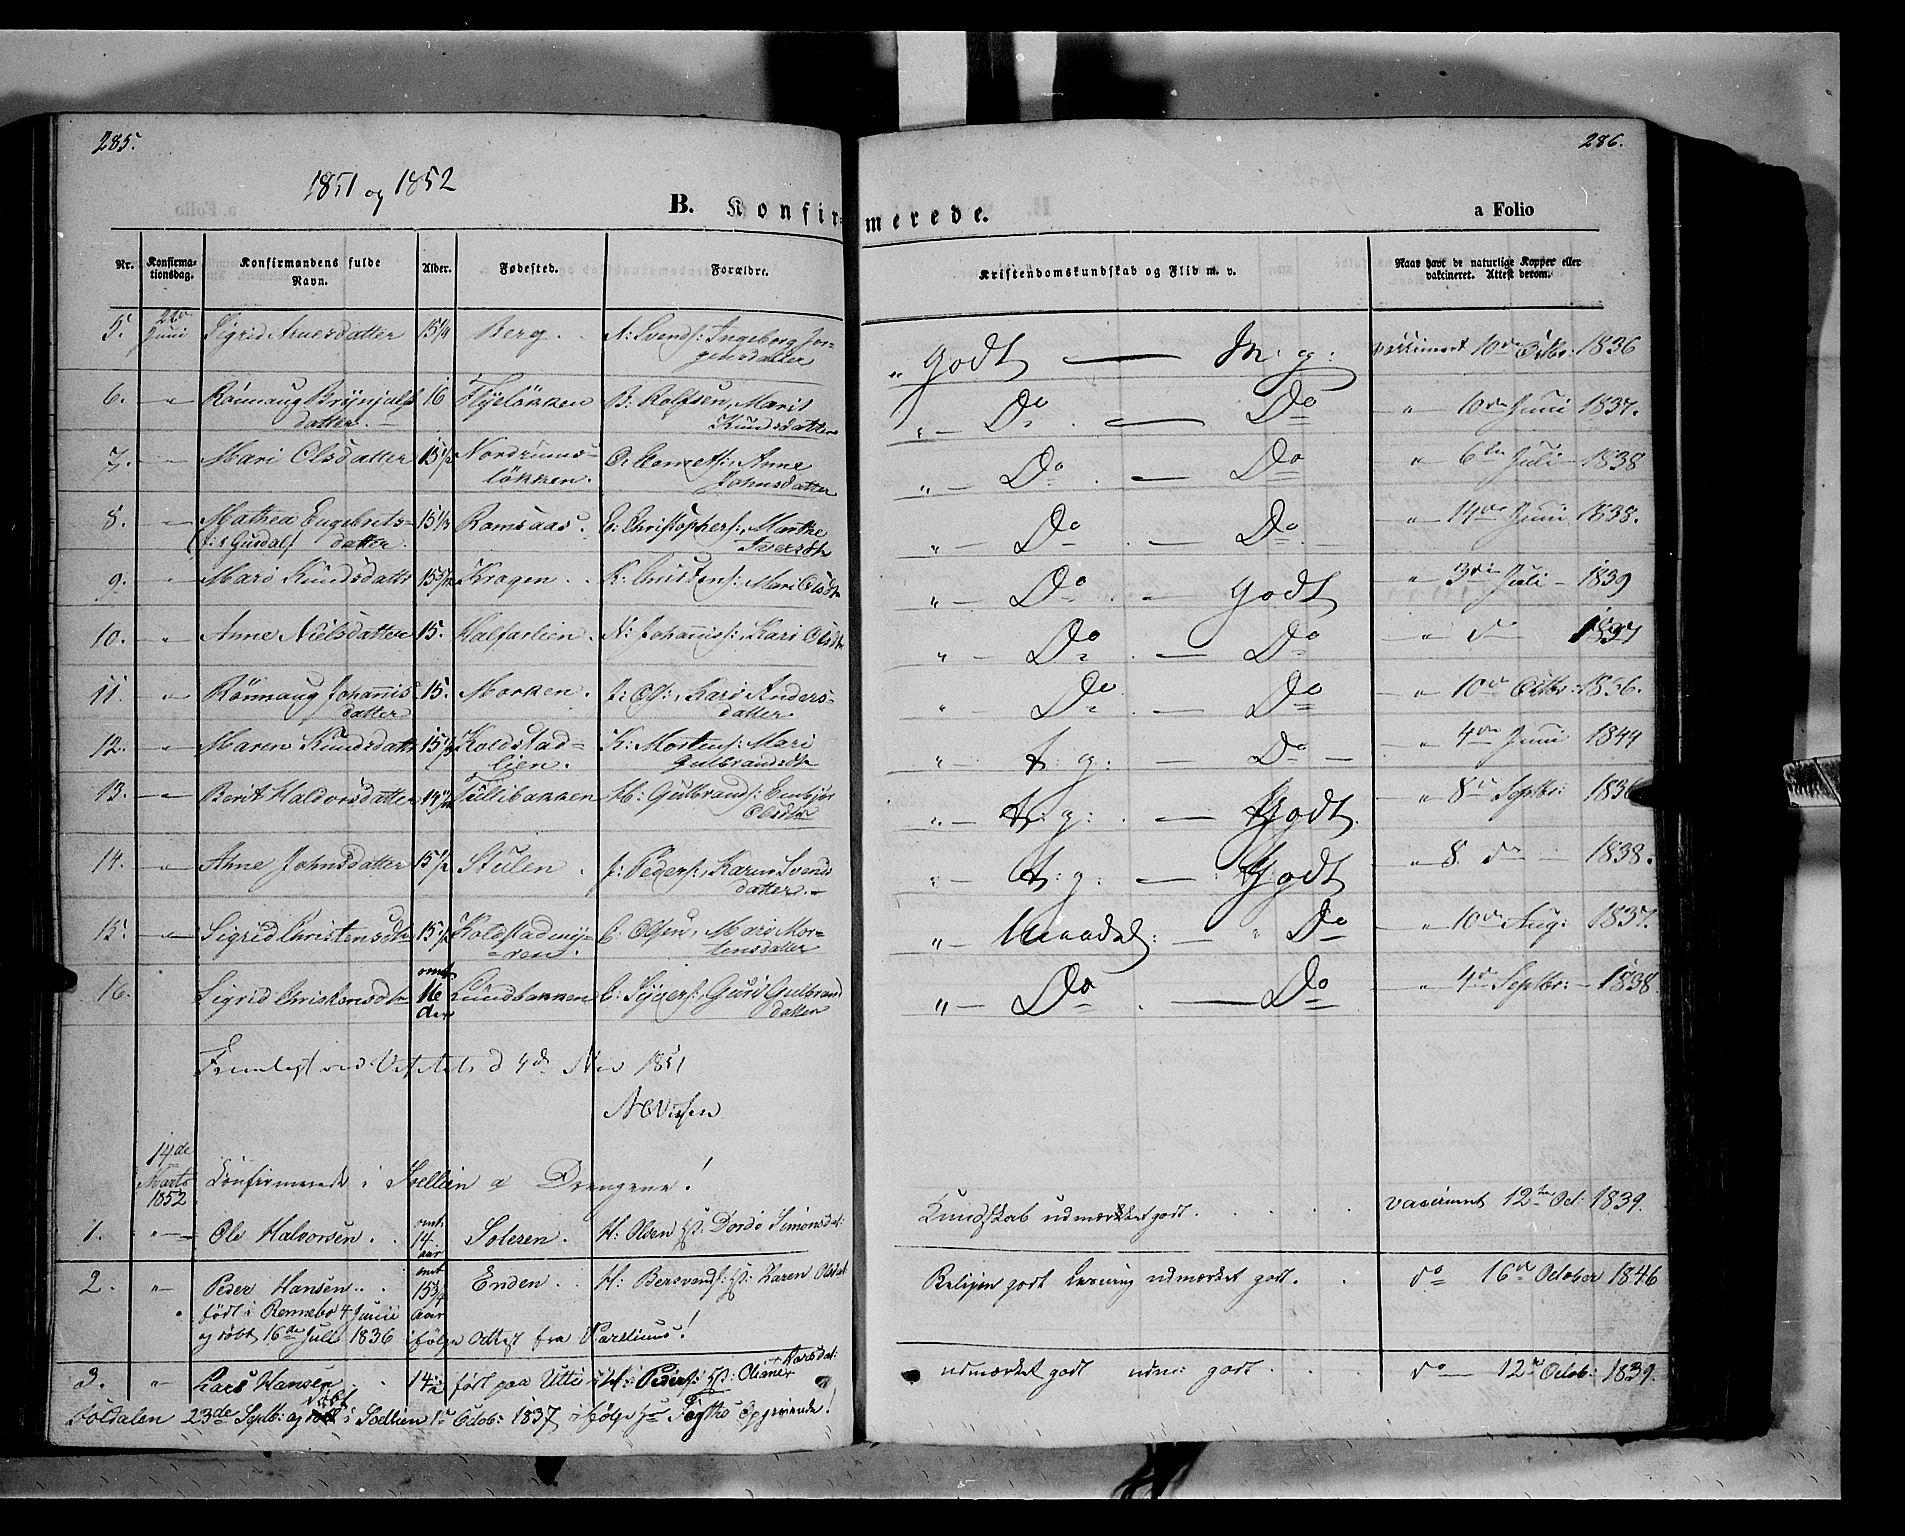 SAH, Ringebu prestekontor, Ministerialbok nr. 6, 1848-1859, s. 285-286